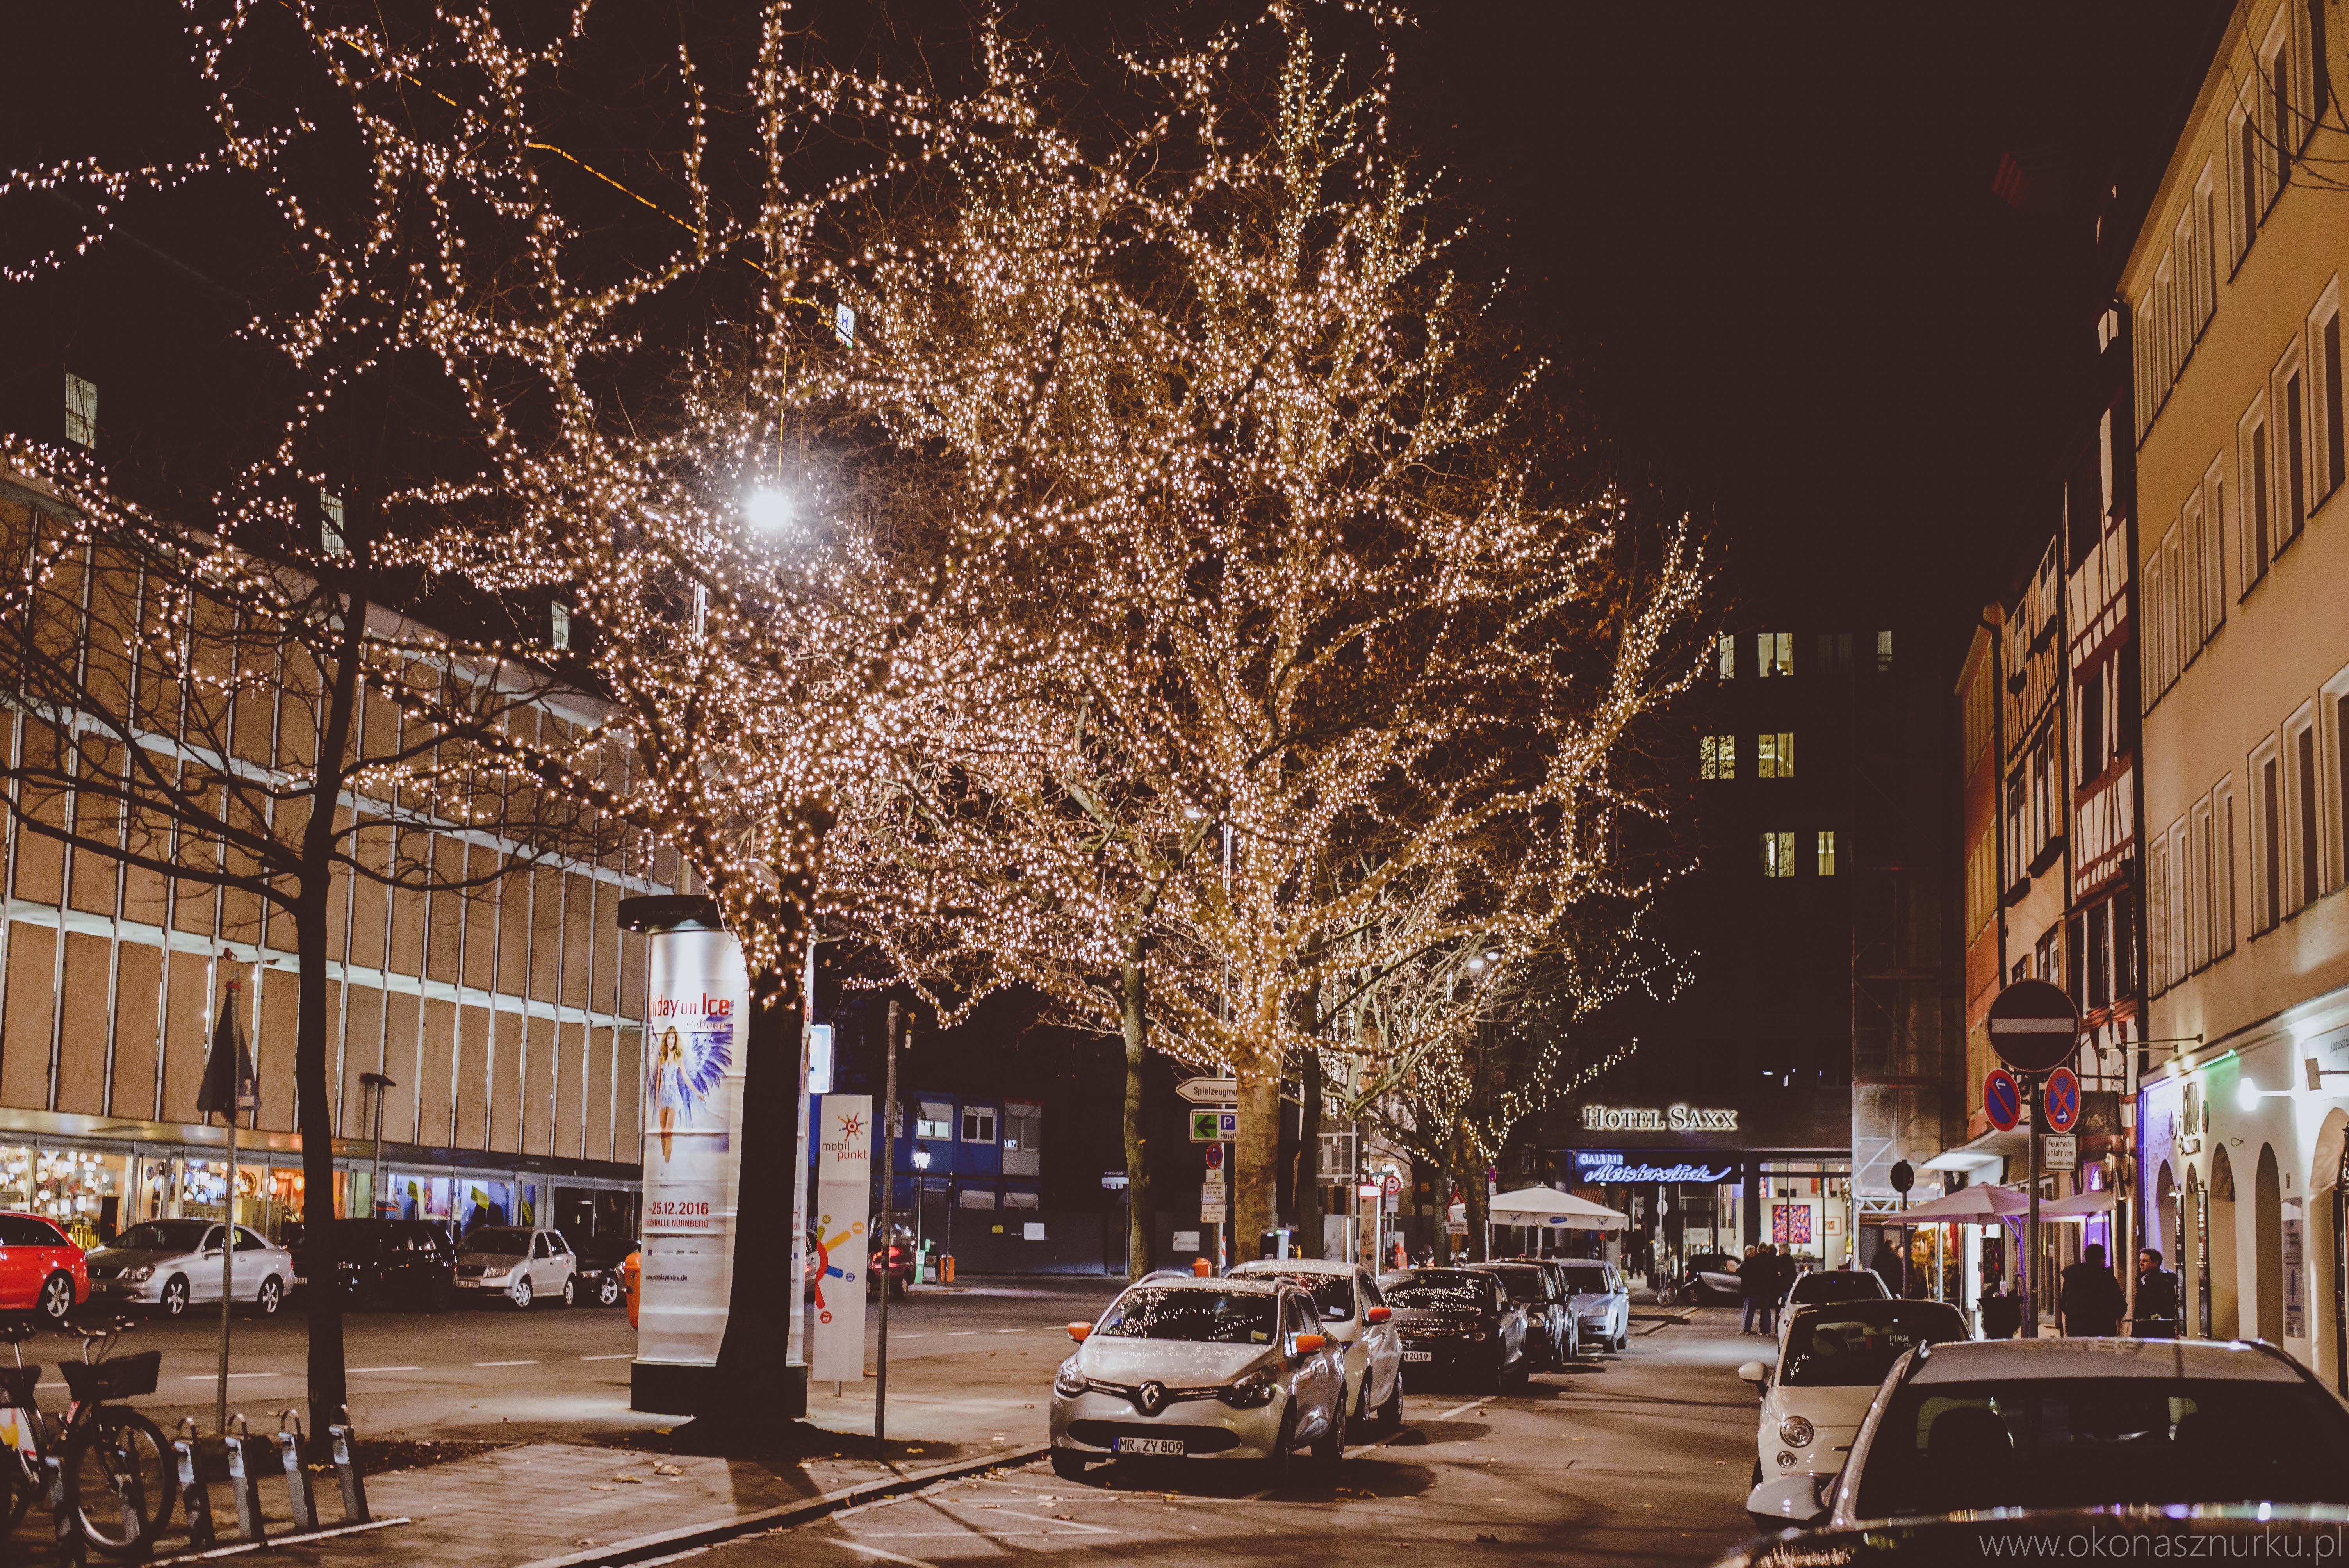 Nürnberg-stadt-norymberga-bayern-city-frankonia (5)